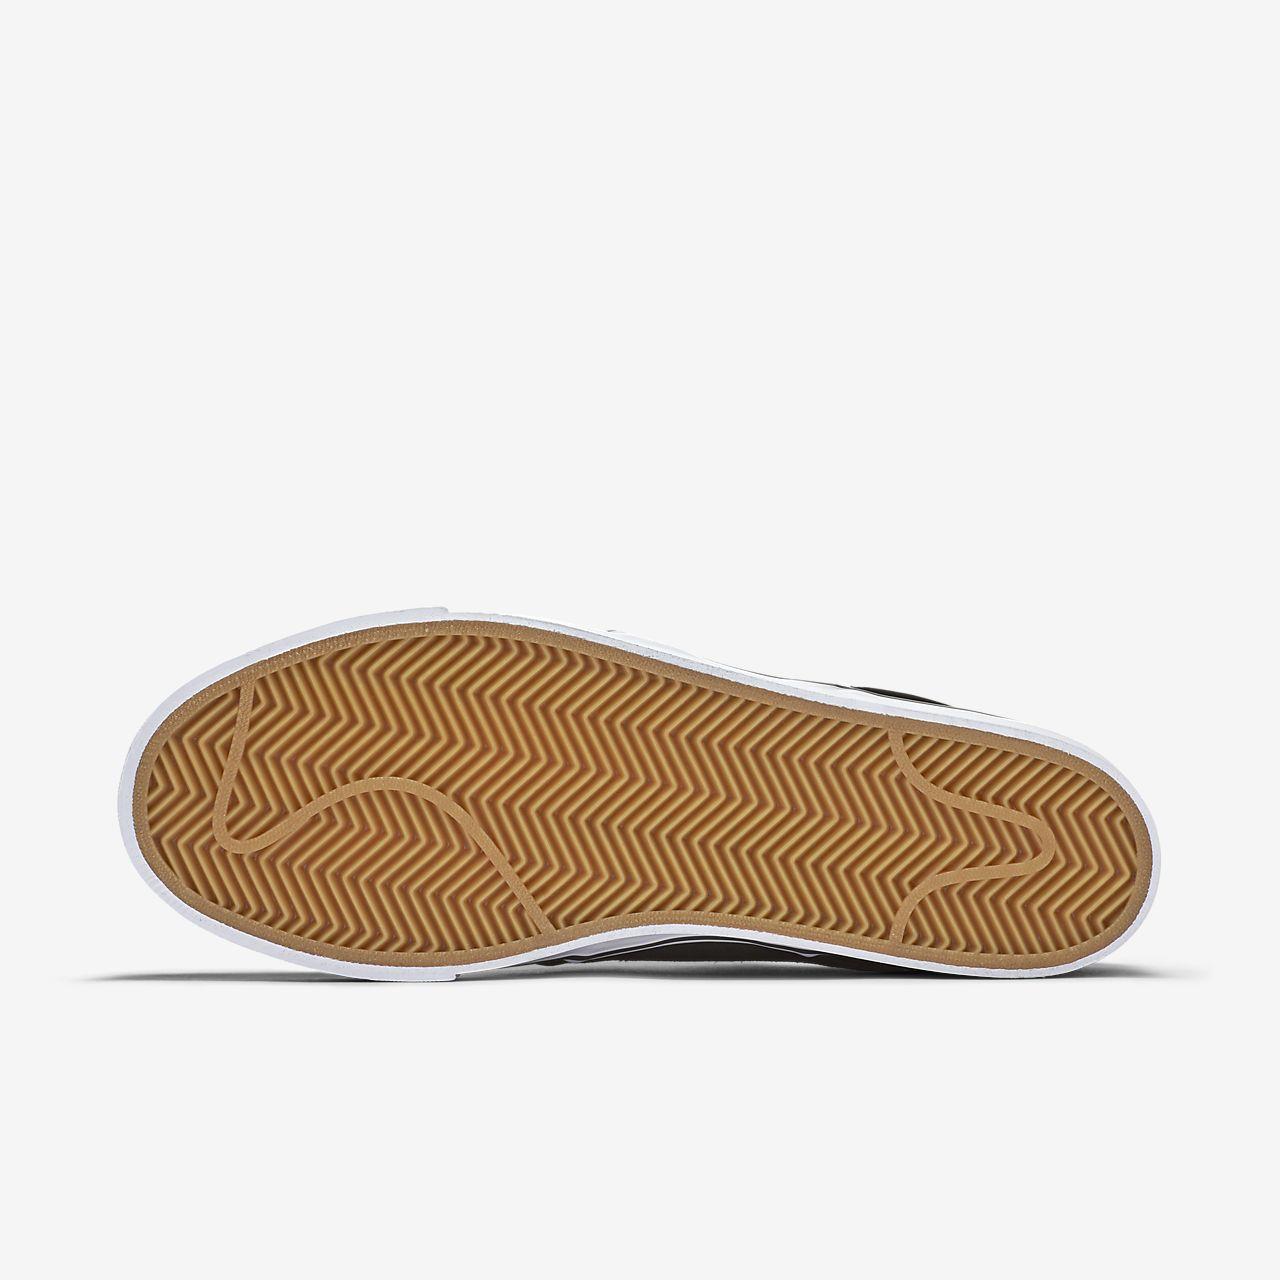 buy online 3cc2d 340c0 ... Chaussure de skateboard Nike SB Zoom Stefan Janoski OG pour Homme. Low  Resolution ...